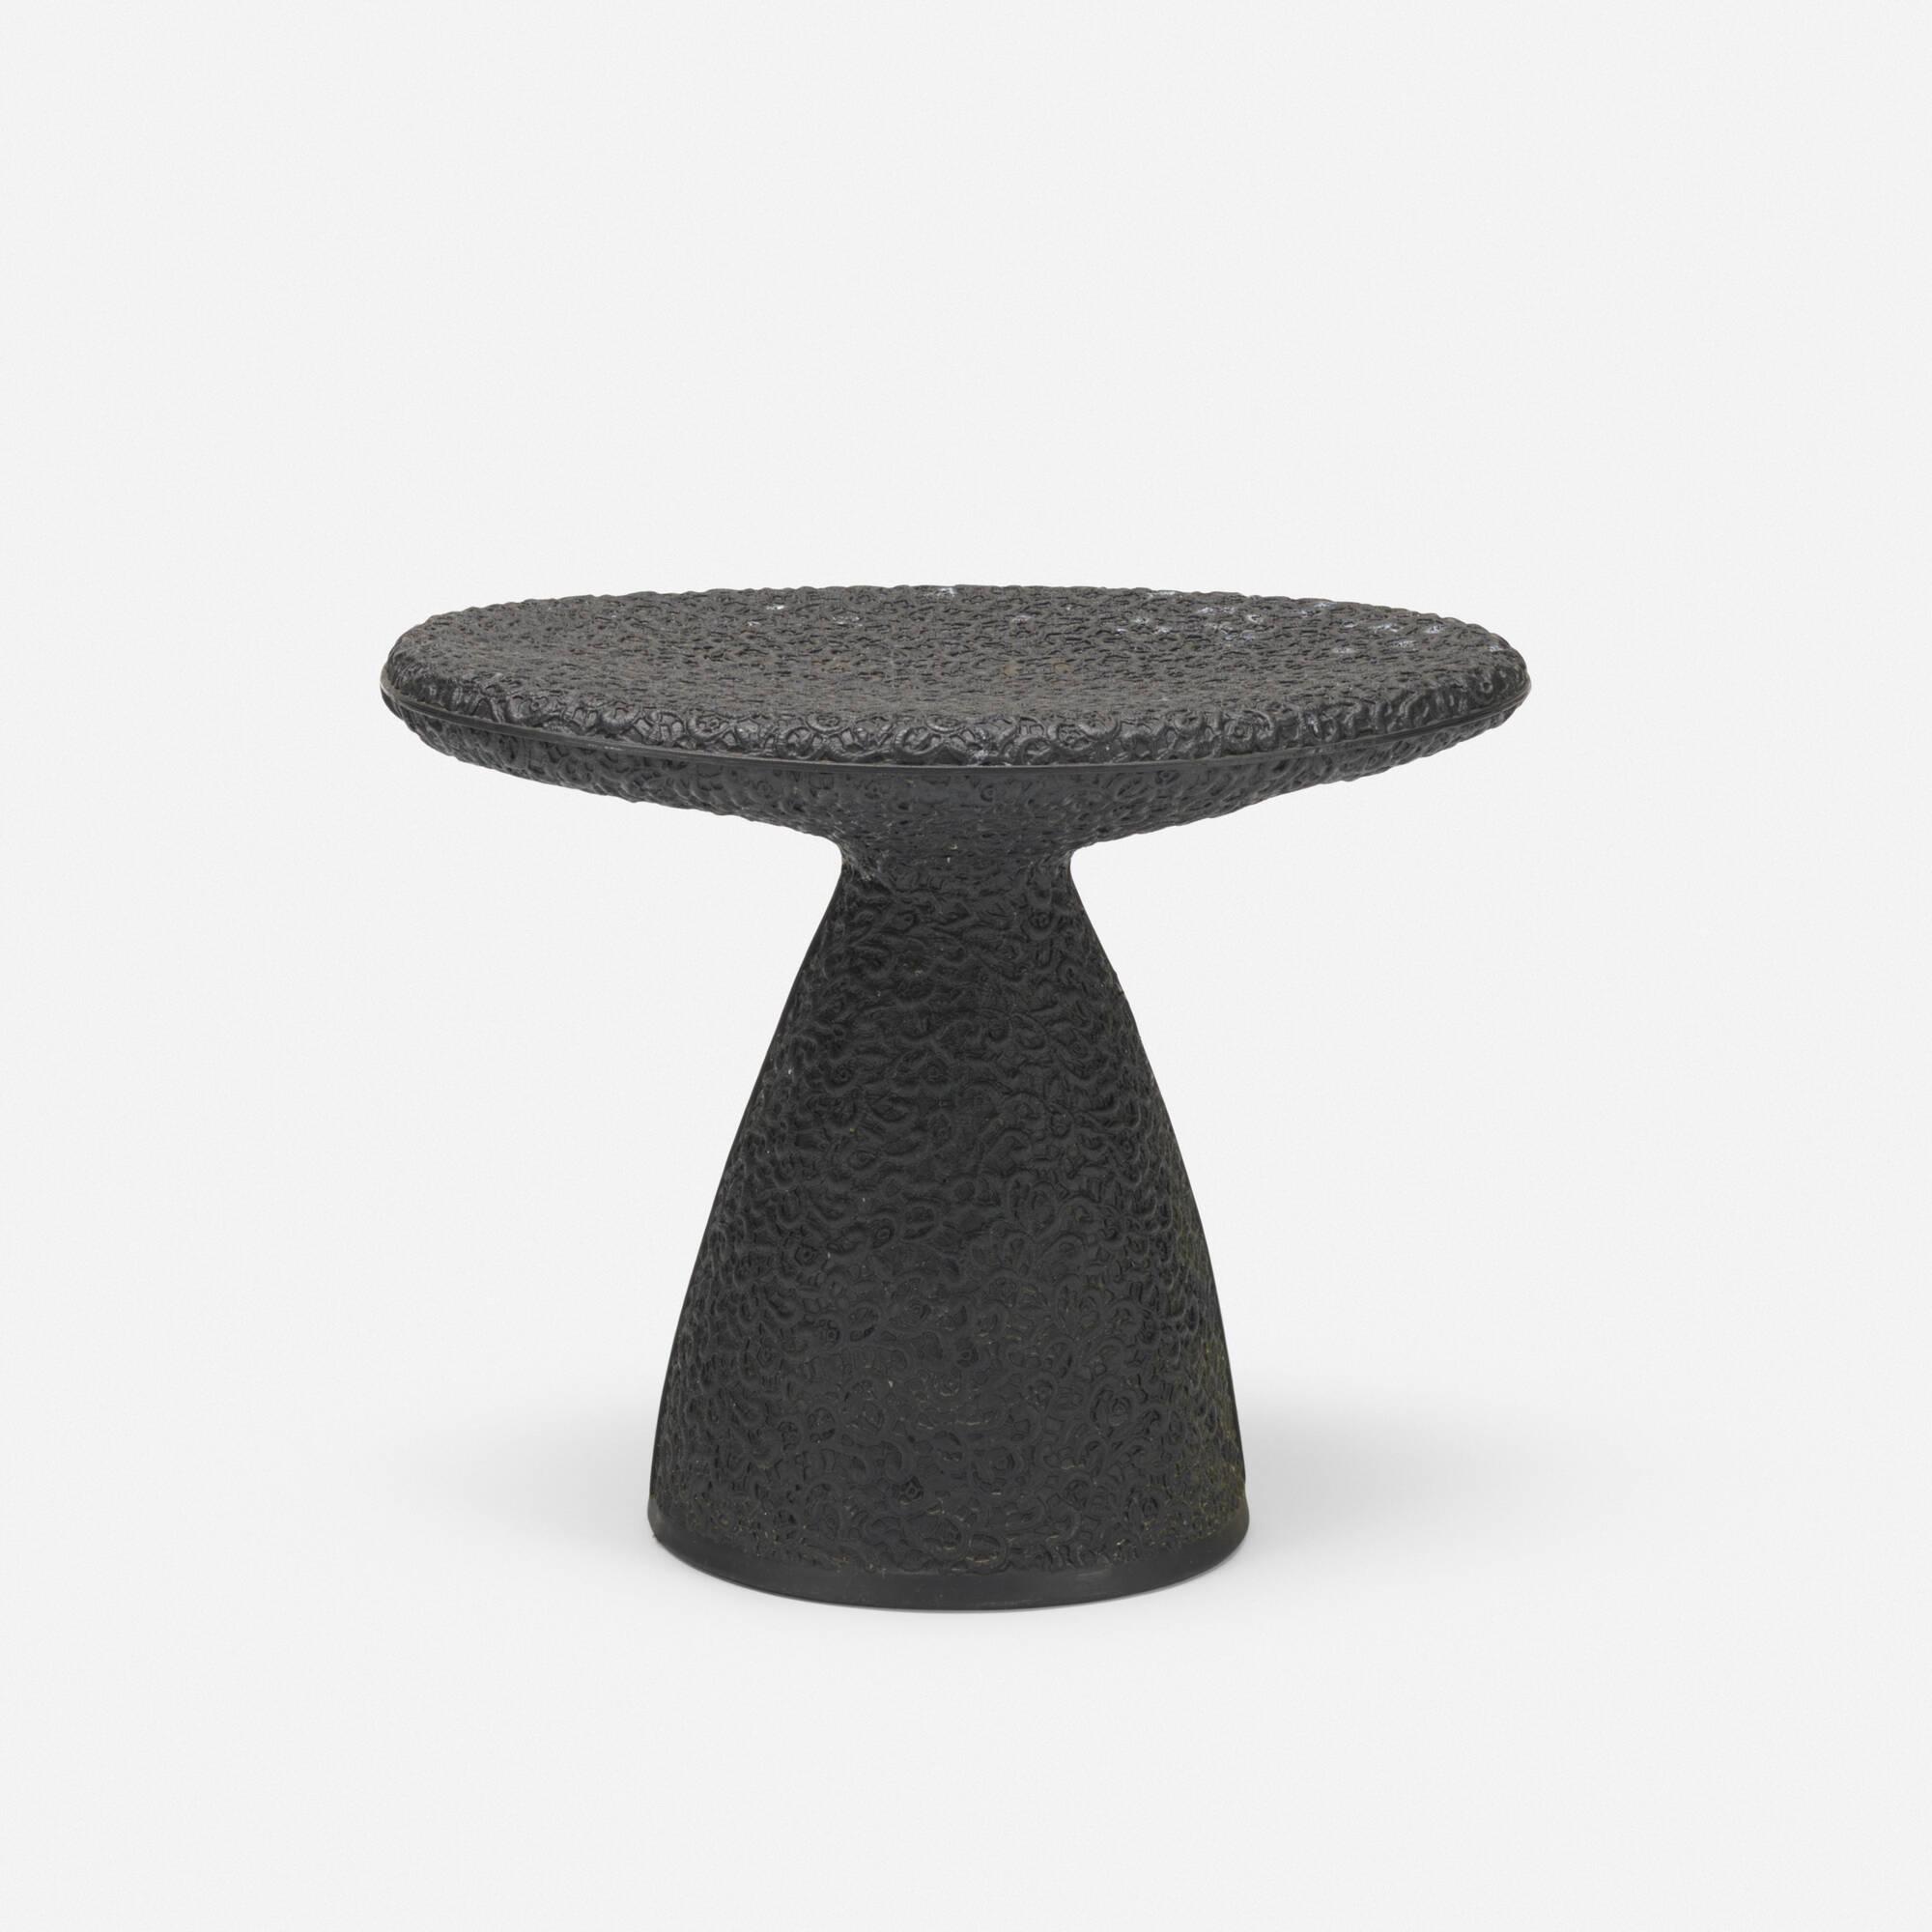 197: Marcel Wanders / Shitake stool (1 of 2)